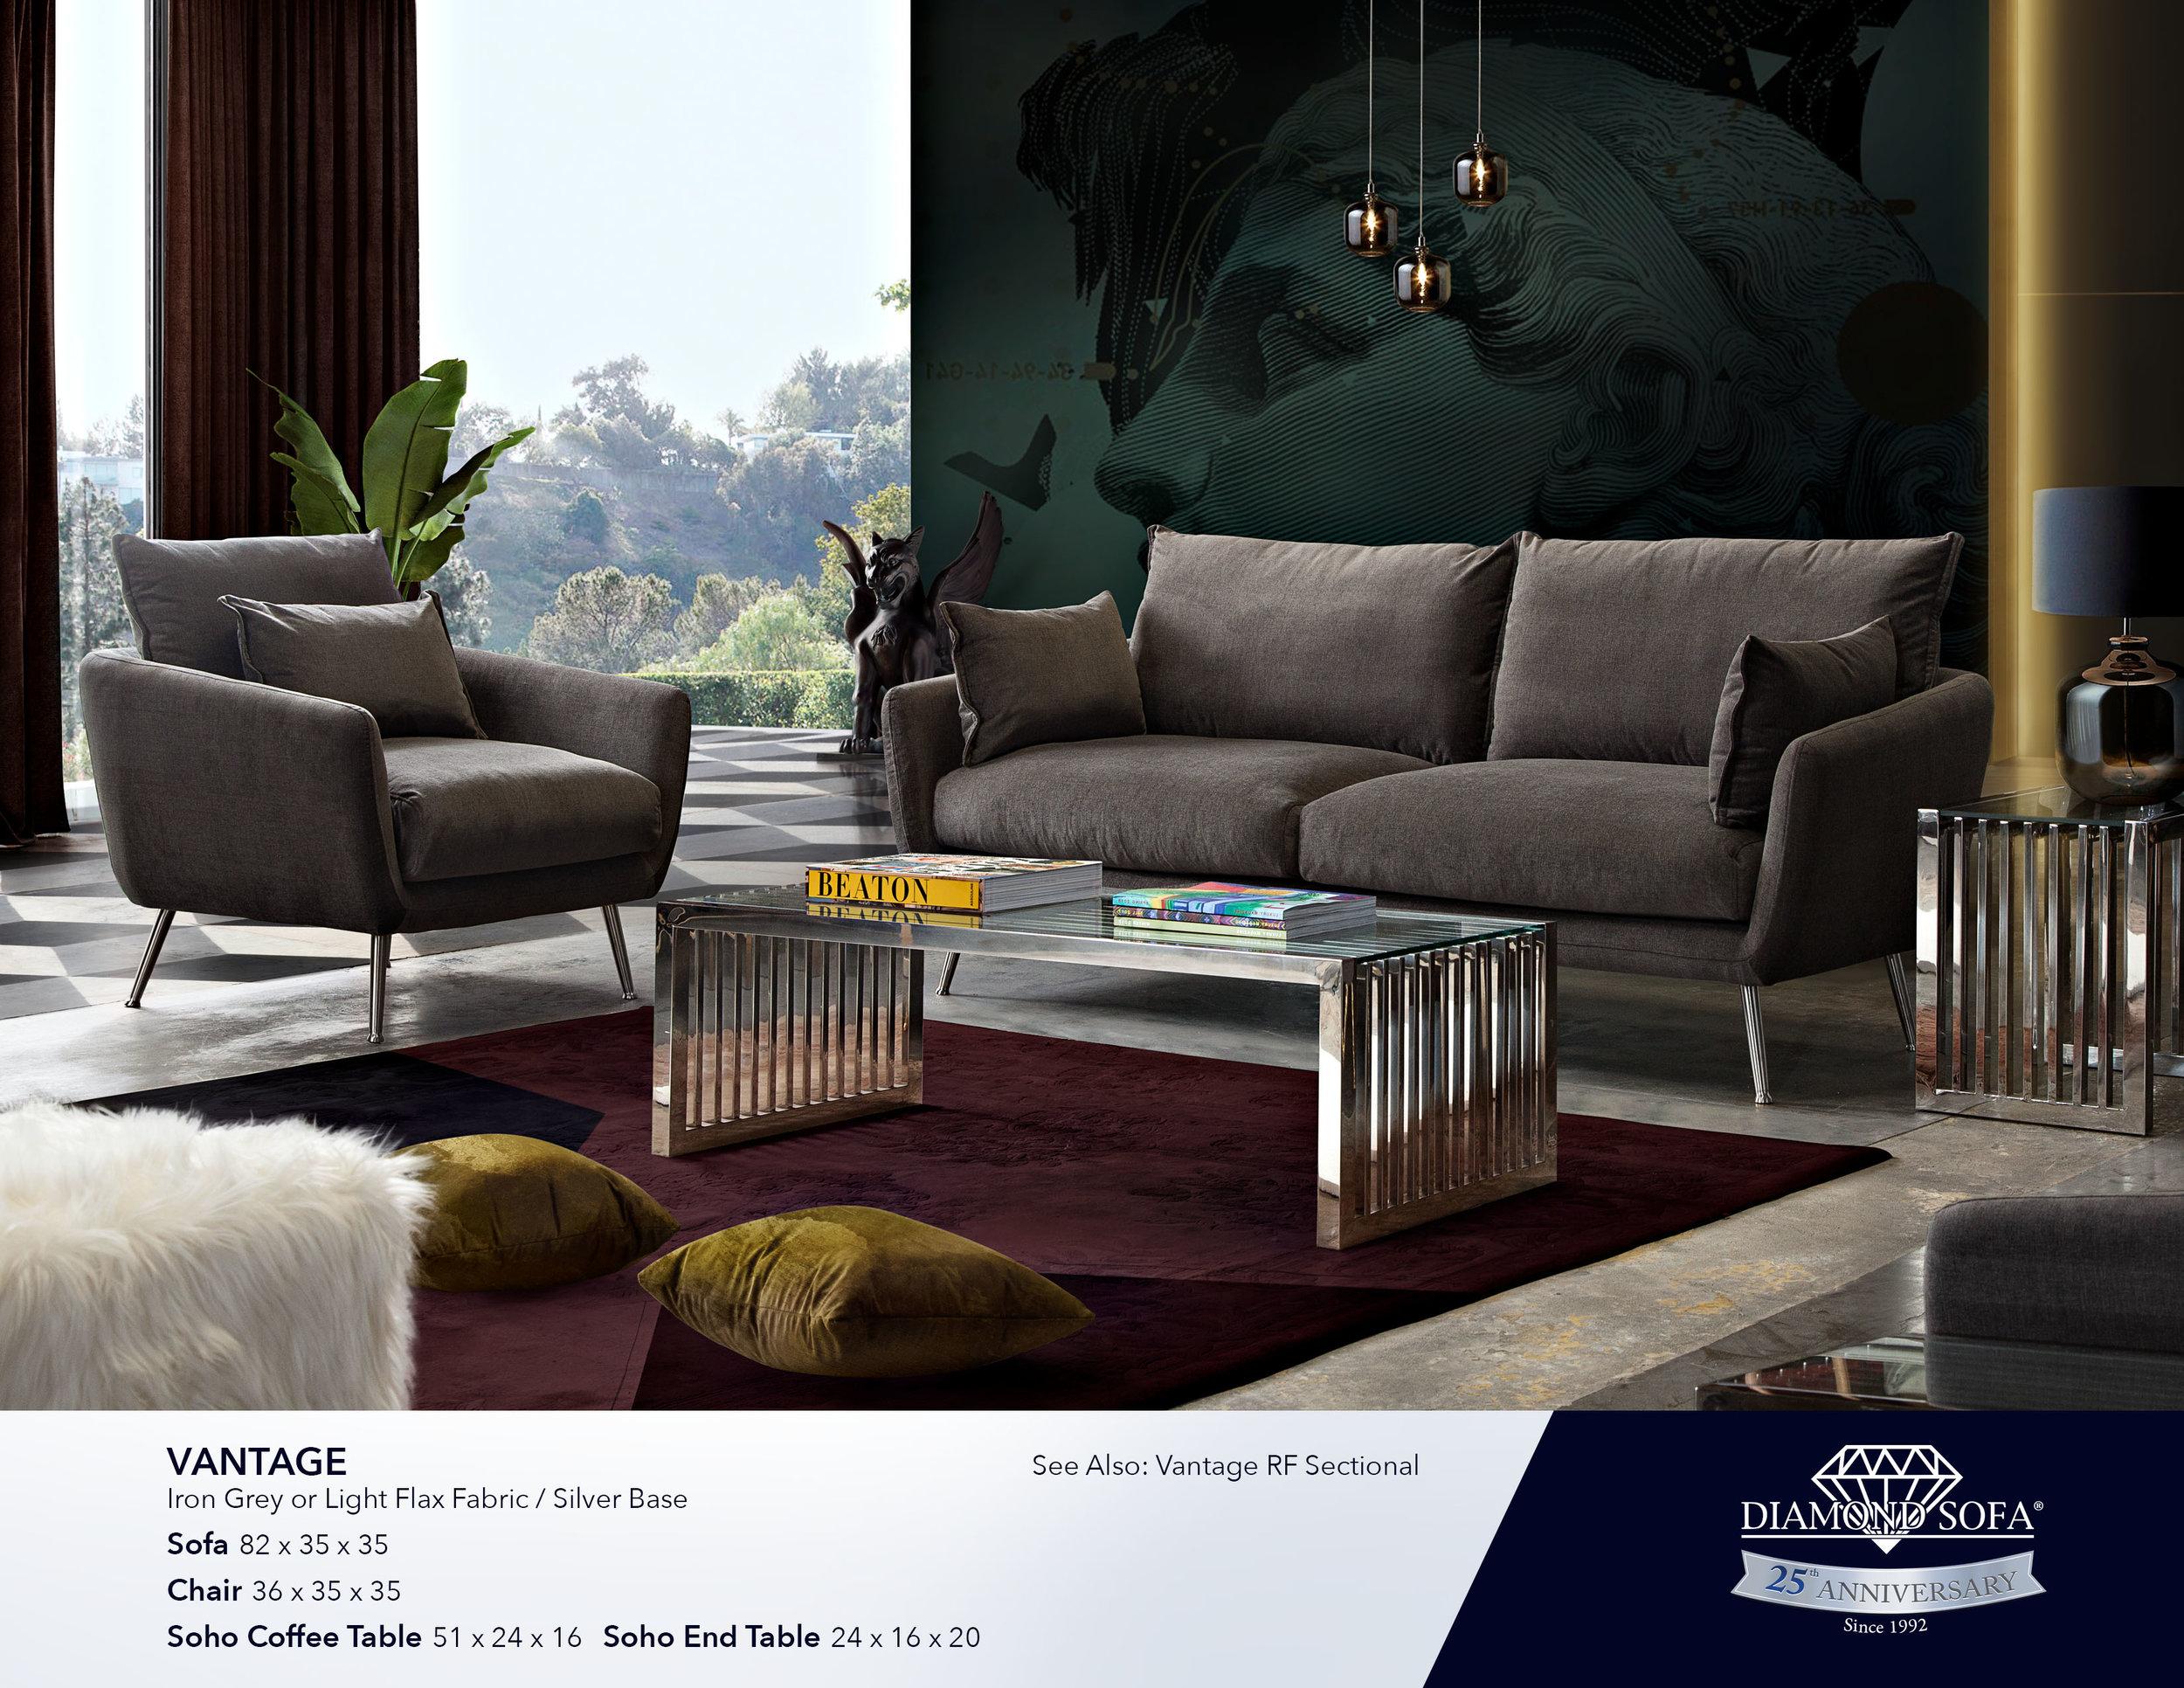 vantage-sofa-chair3.jpg